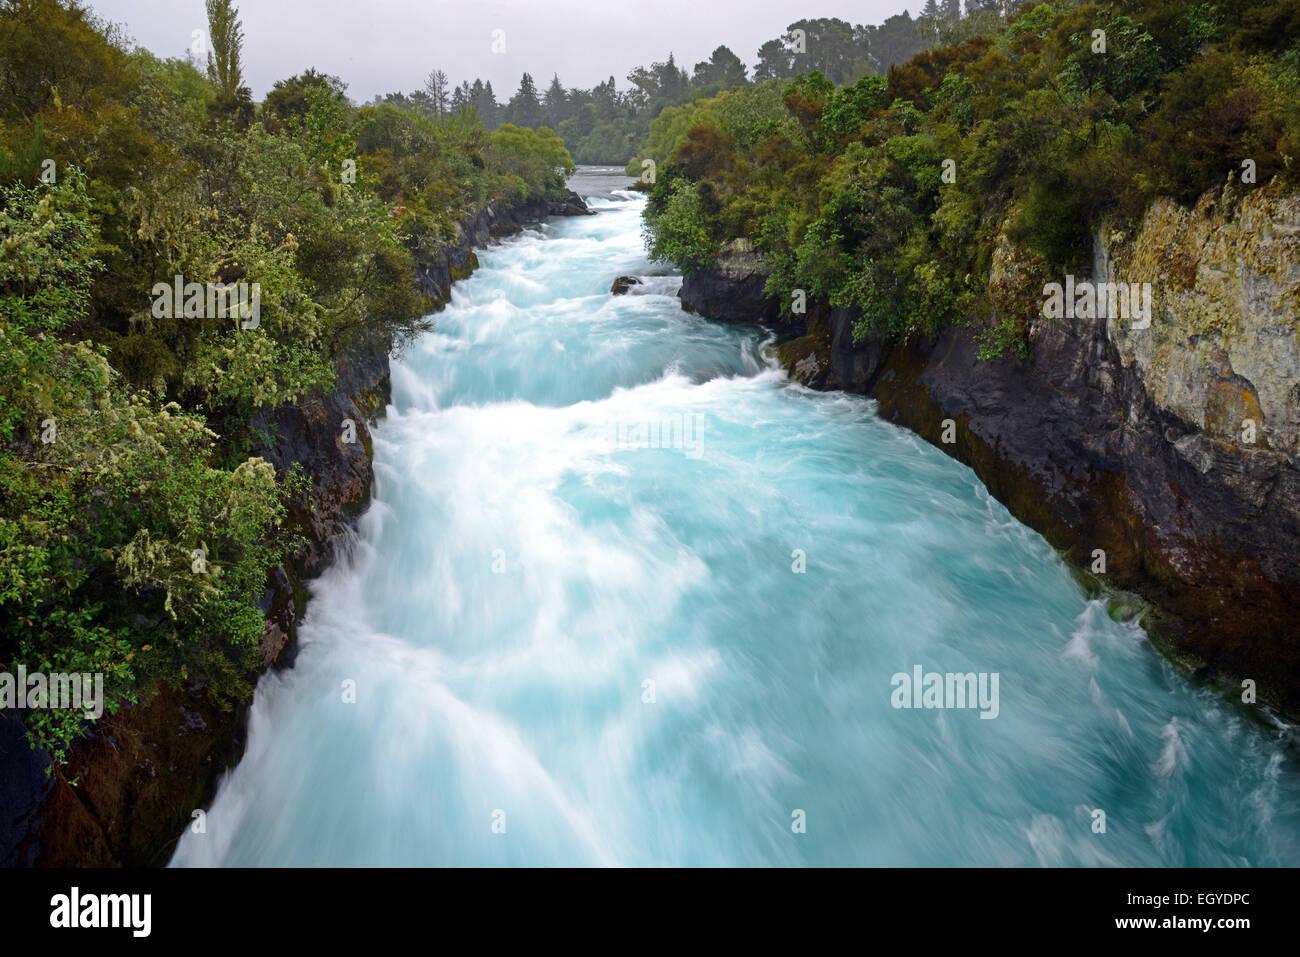 The Huka Falls on the Waikato River, near Taupo, on the North Island of New Zealand. - Stock Image